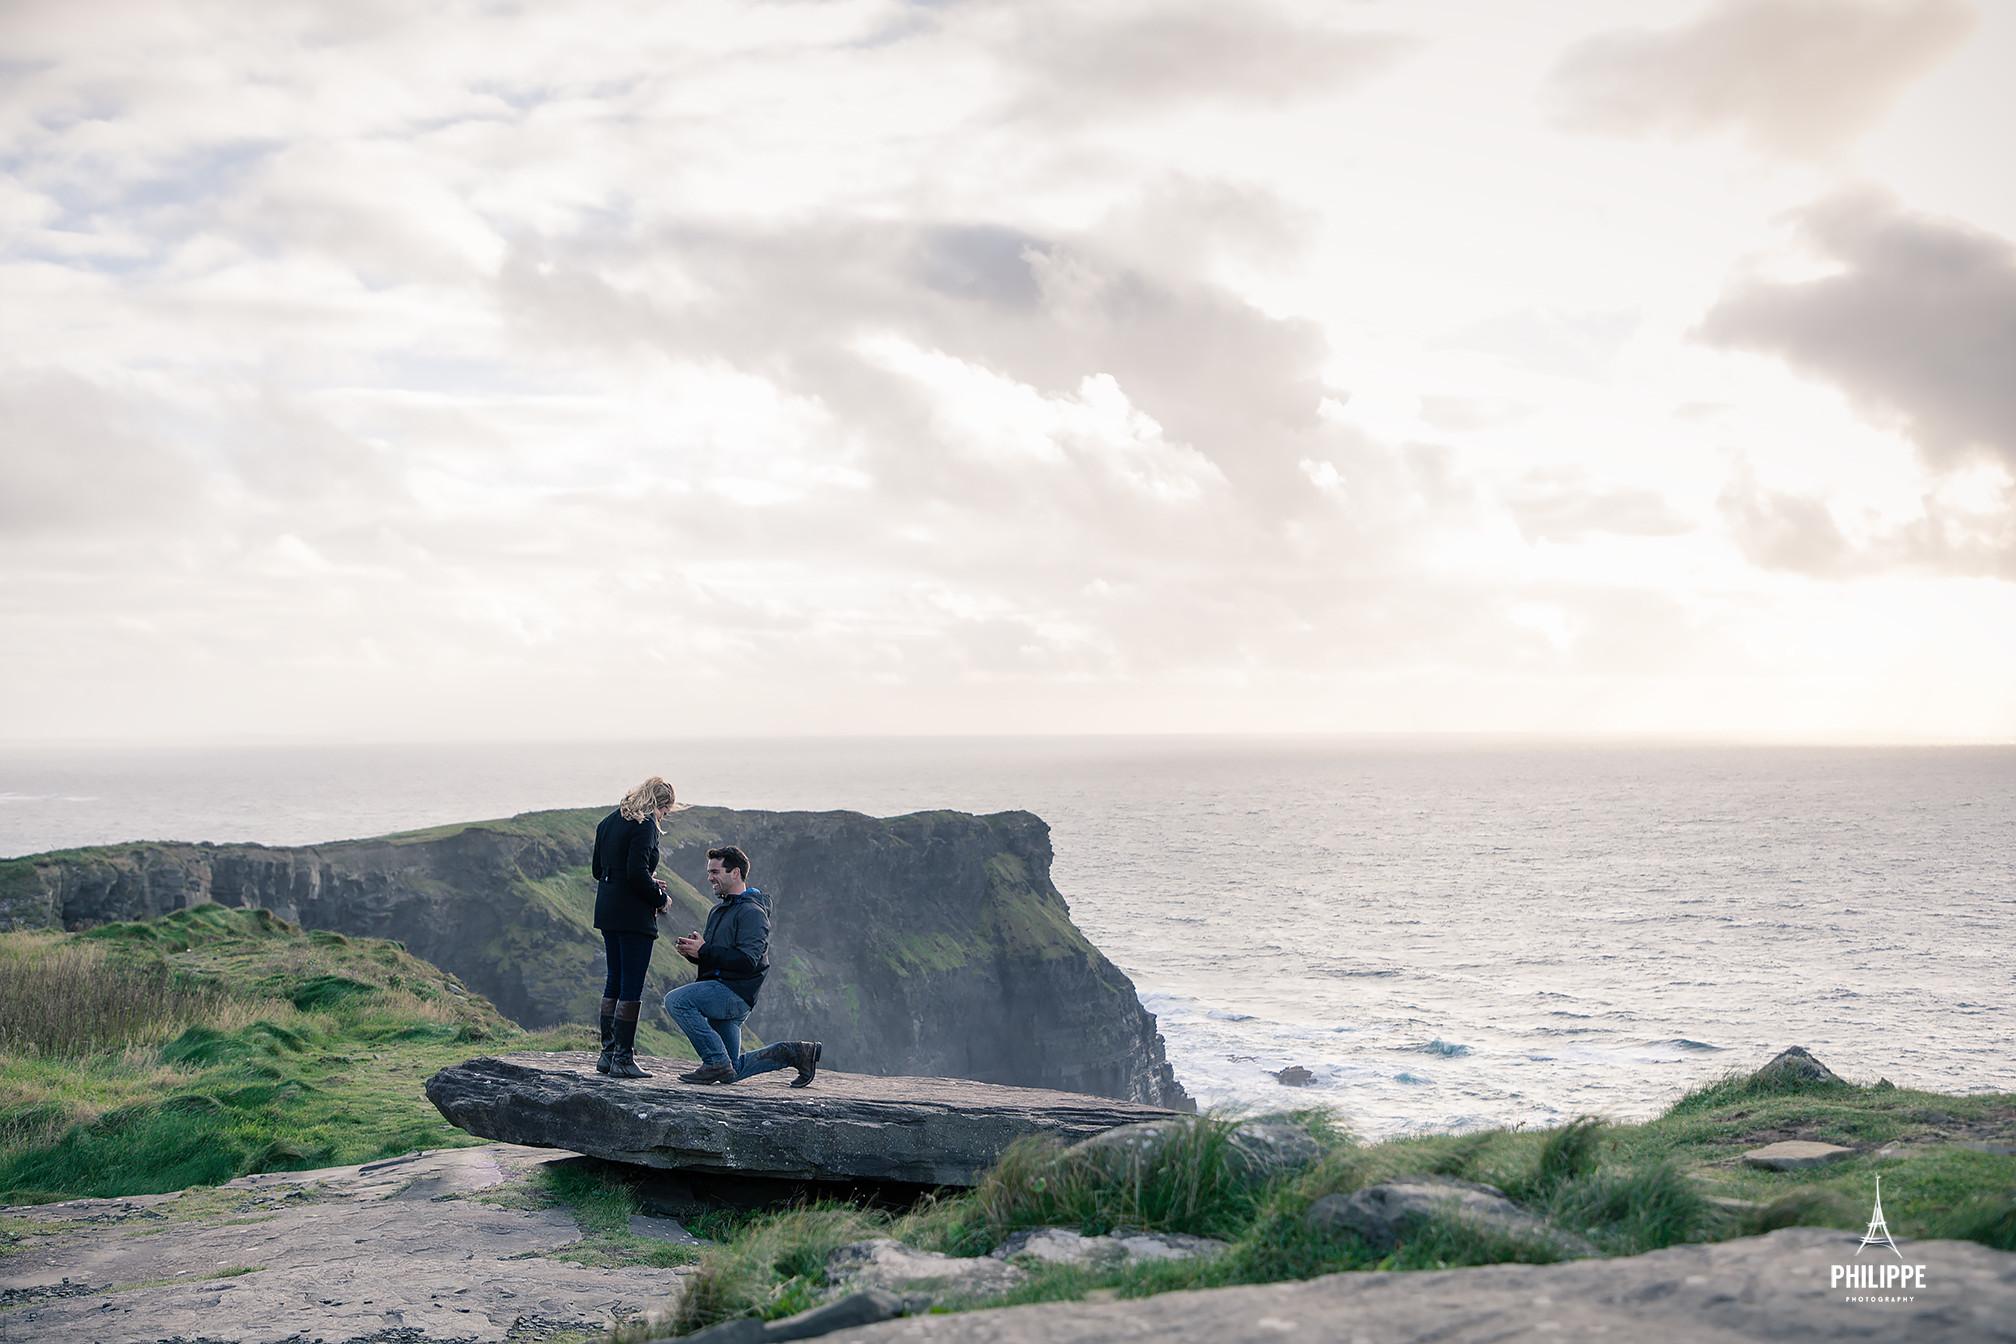 Ireland-Clare-wedding-photography-Philippe-engagement-cliffs-Kyle